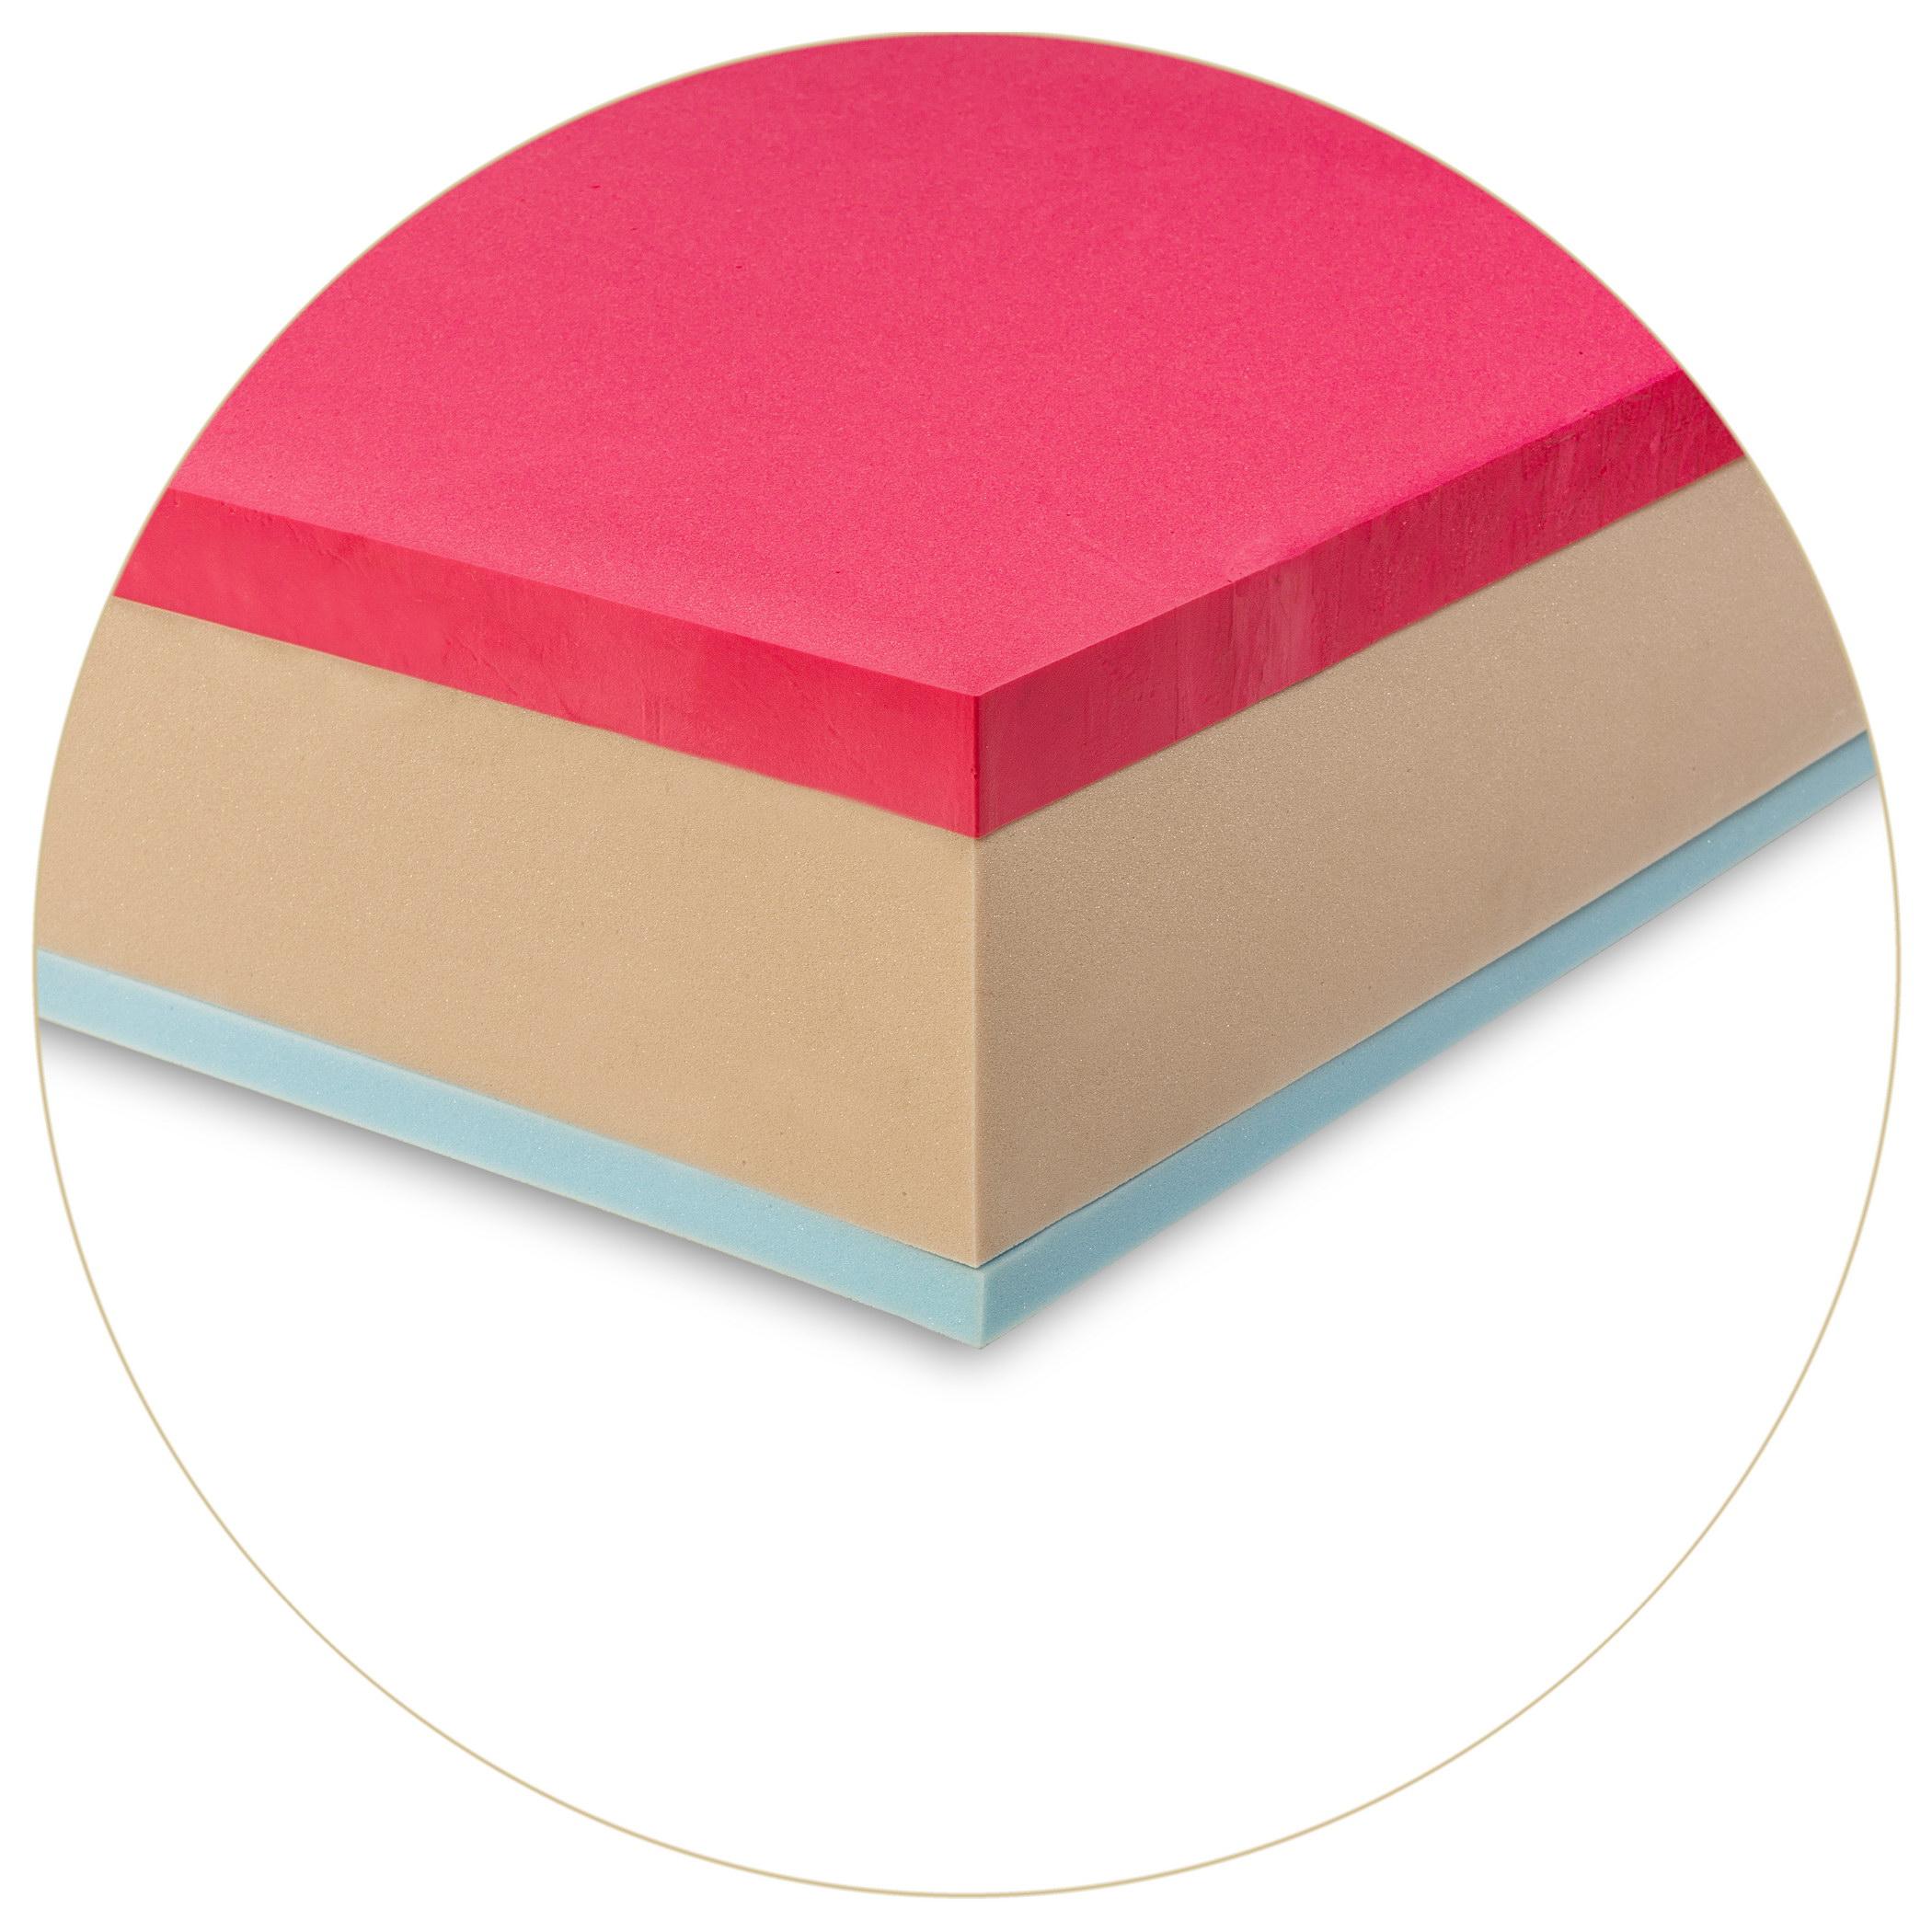 Materasso Memory Con Gel.Materasso Memory Foam Tre Strati Con Gel Memoplus Red Gel Gilbey S